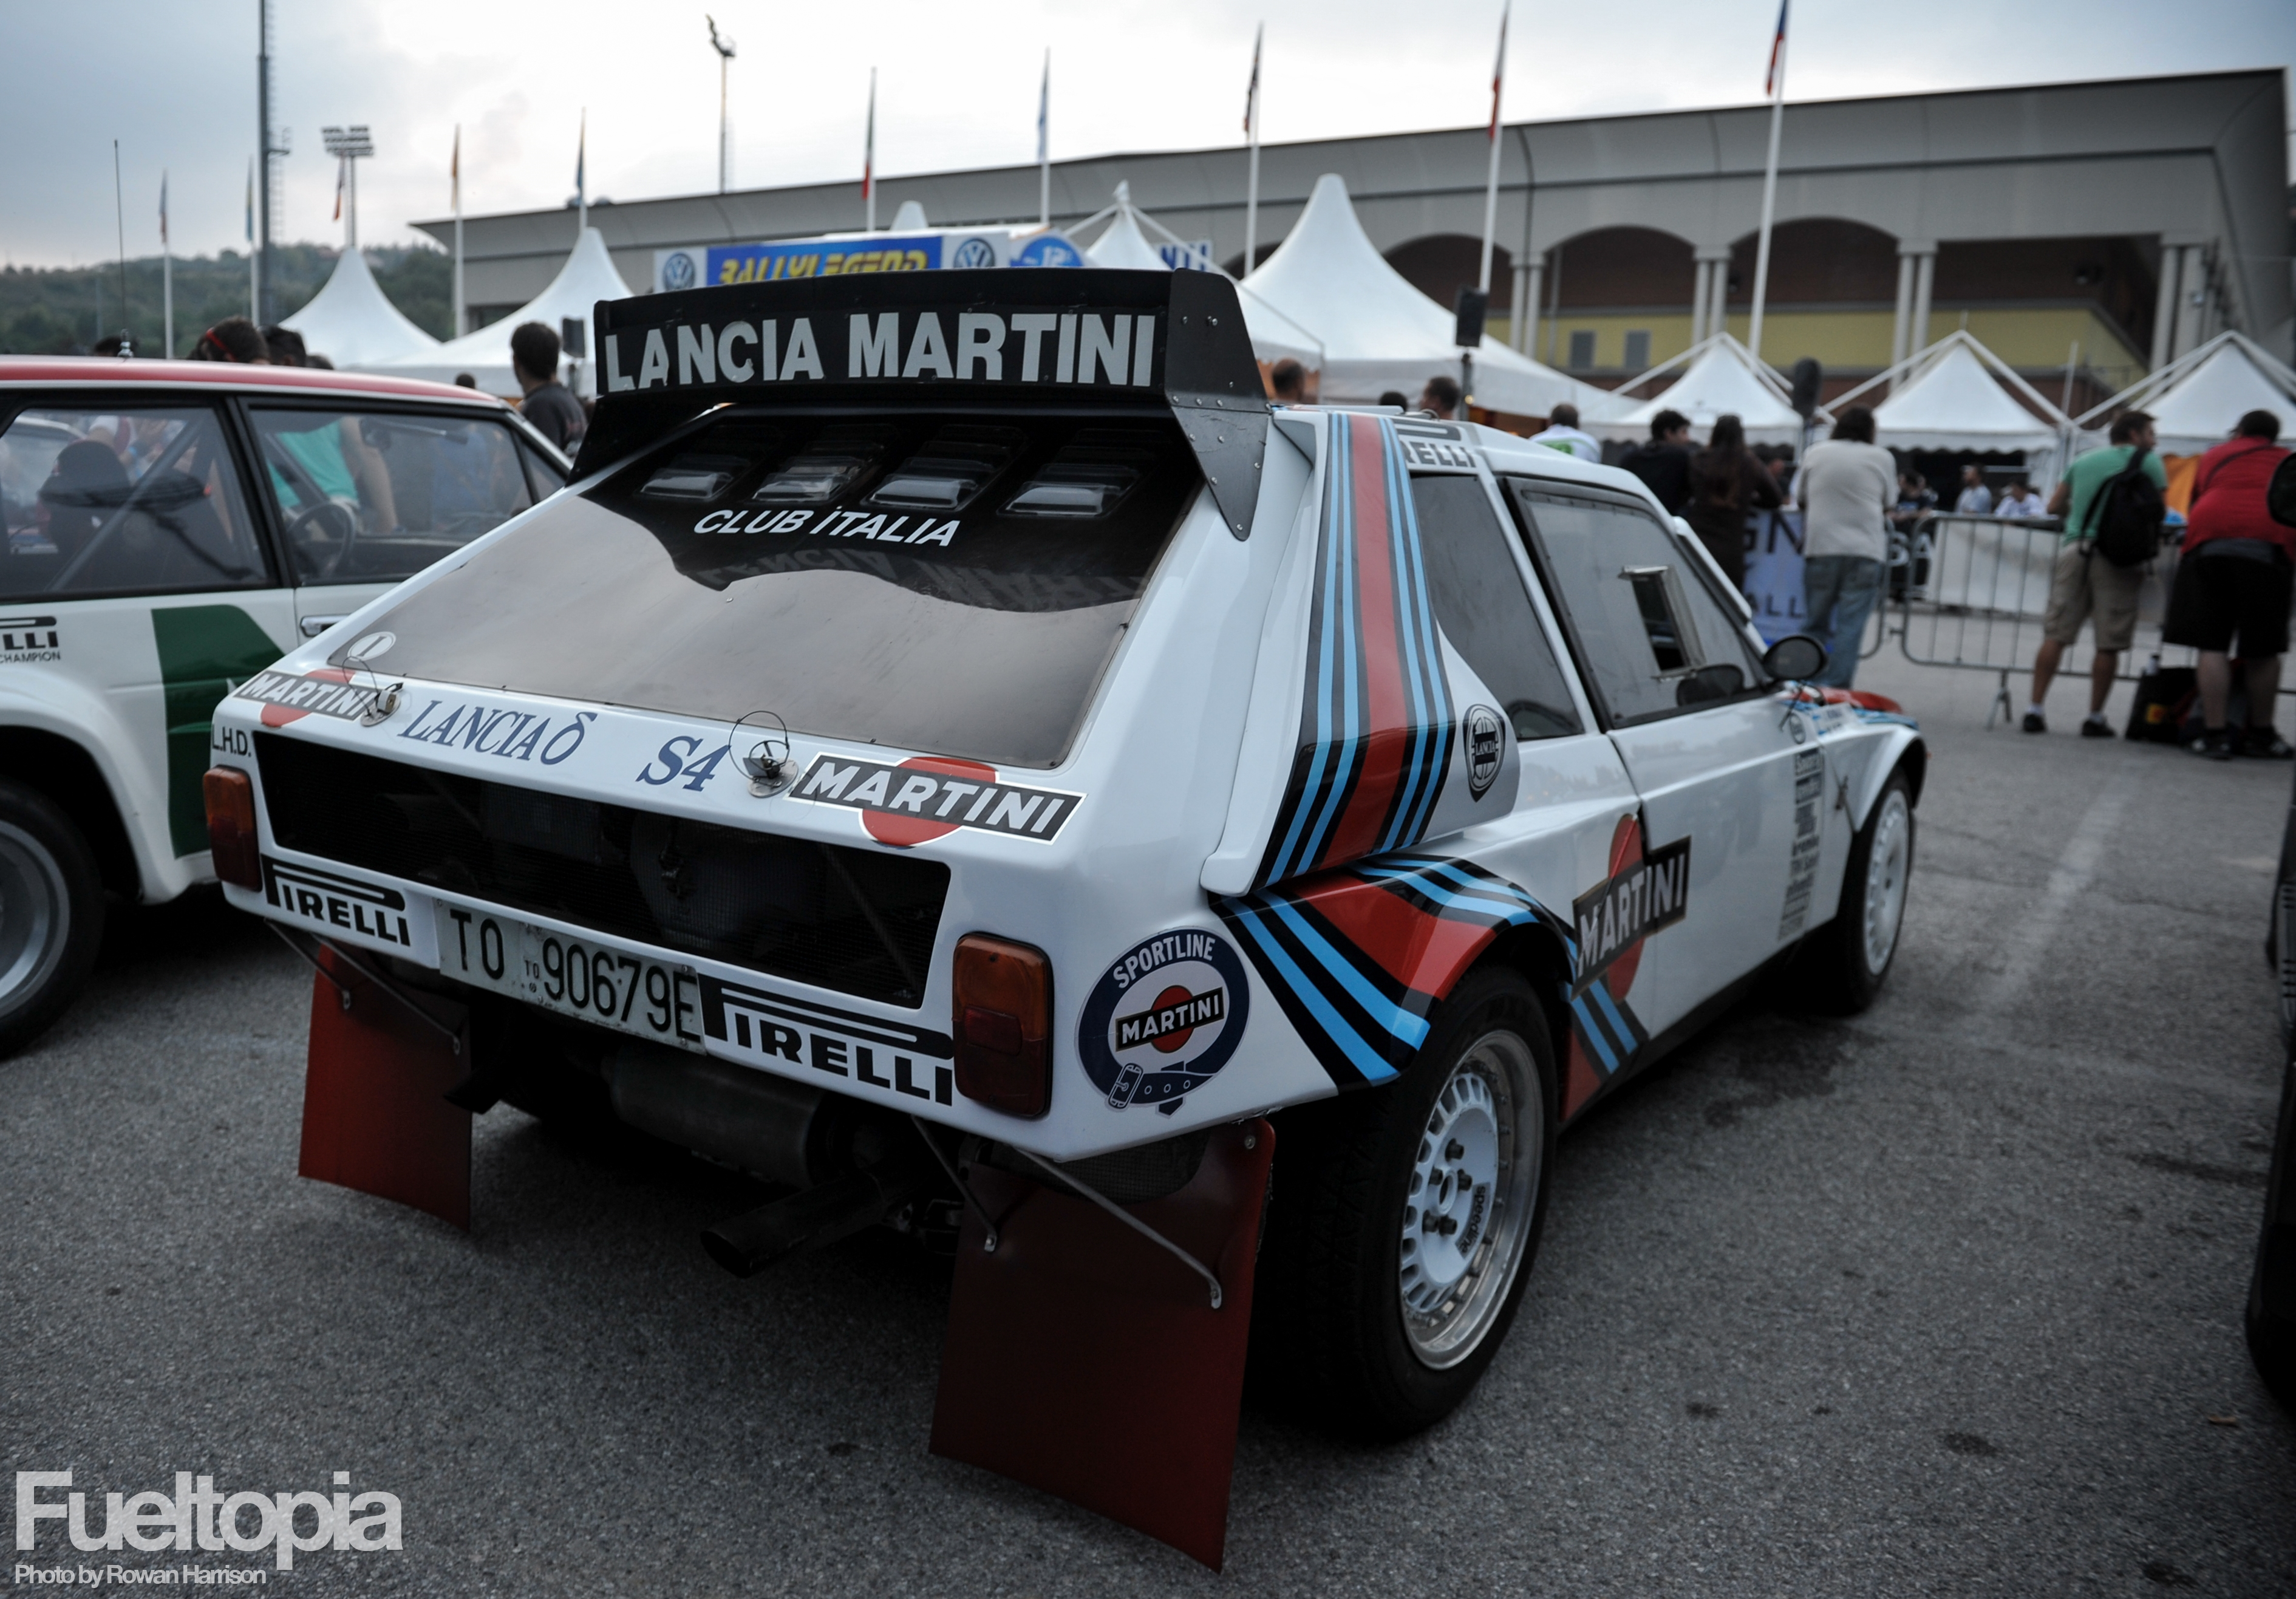 Classic Design Italia San Marino.File Rally Legend 2014 San Marino 14951830773 Jpg